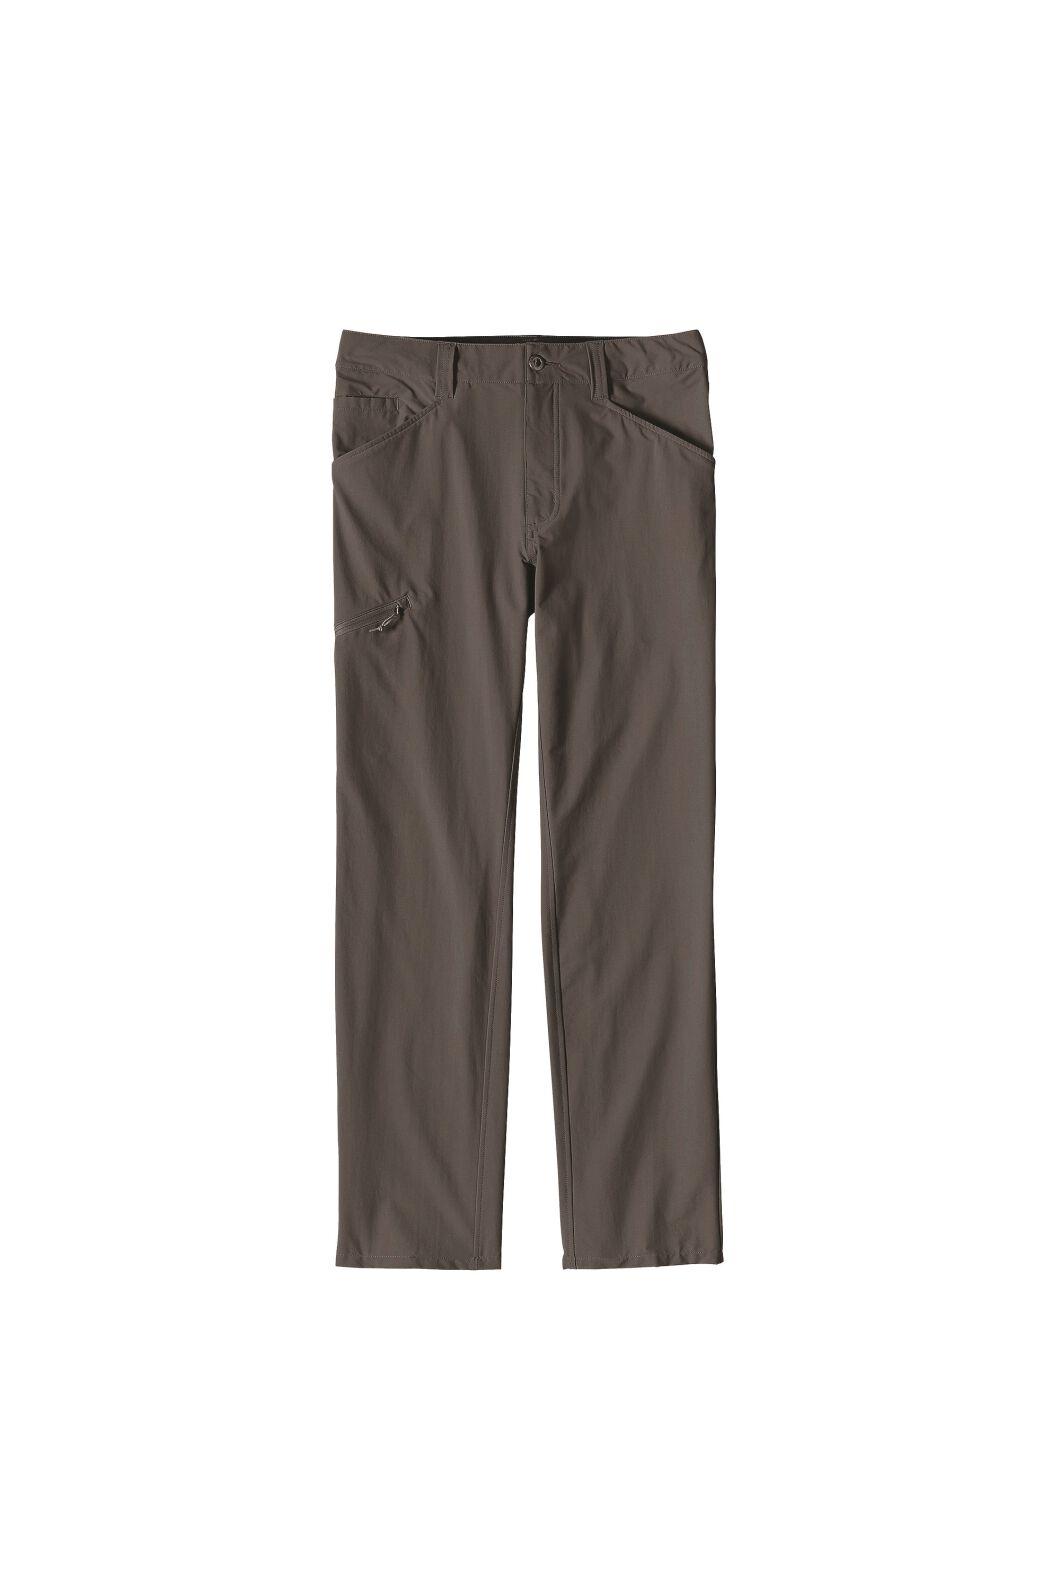 Patagonia Men's Quandary Pants Forge, FORGE GREY, hi-res